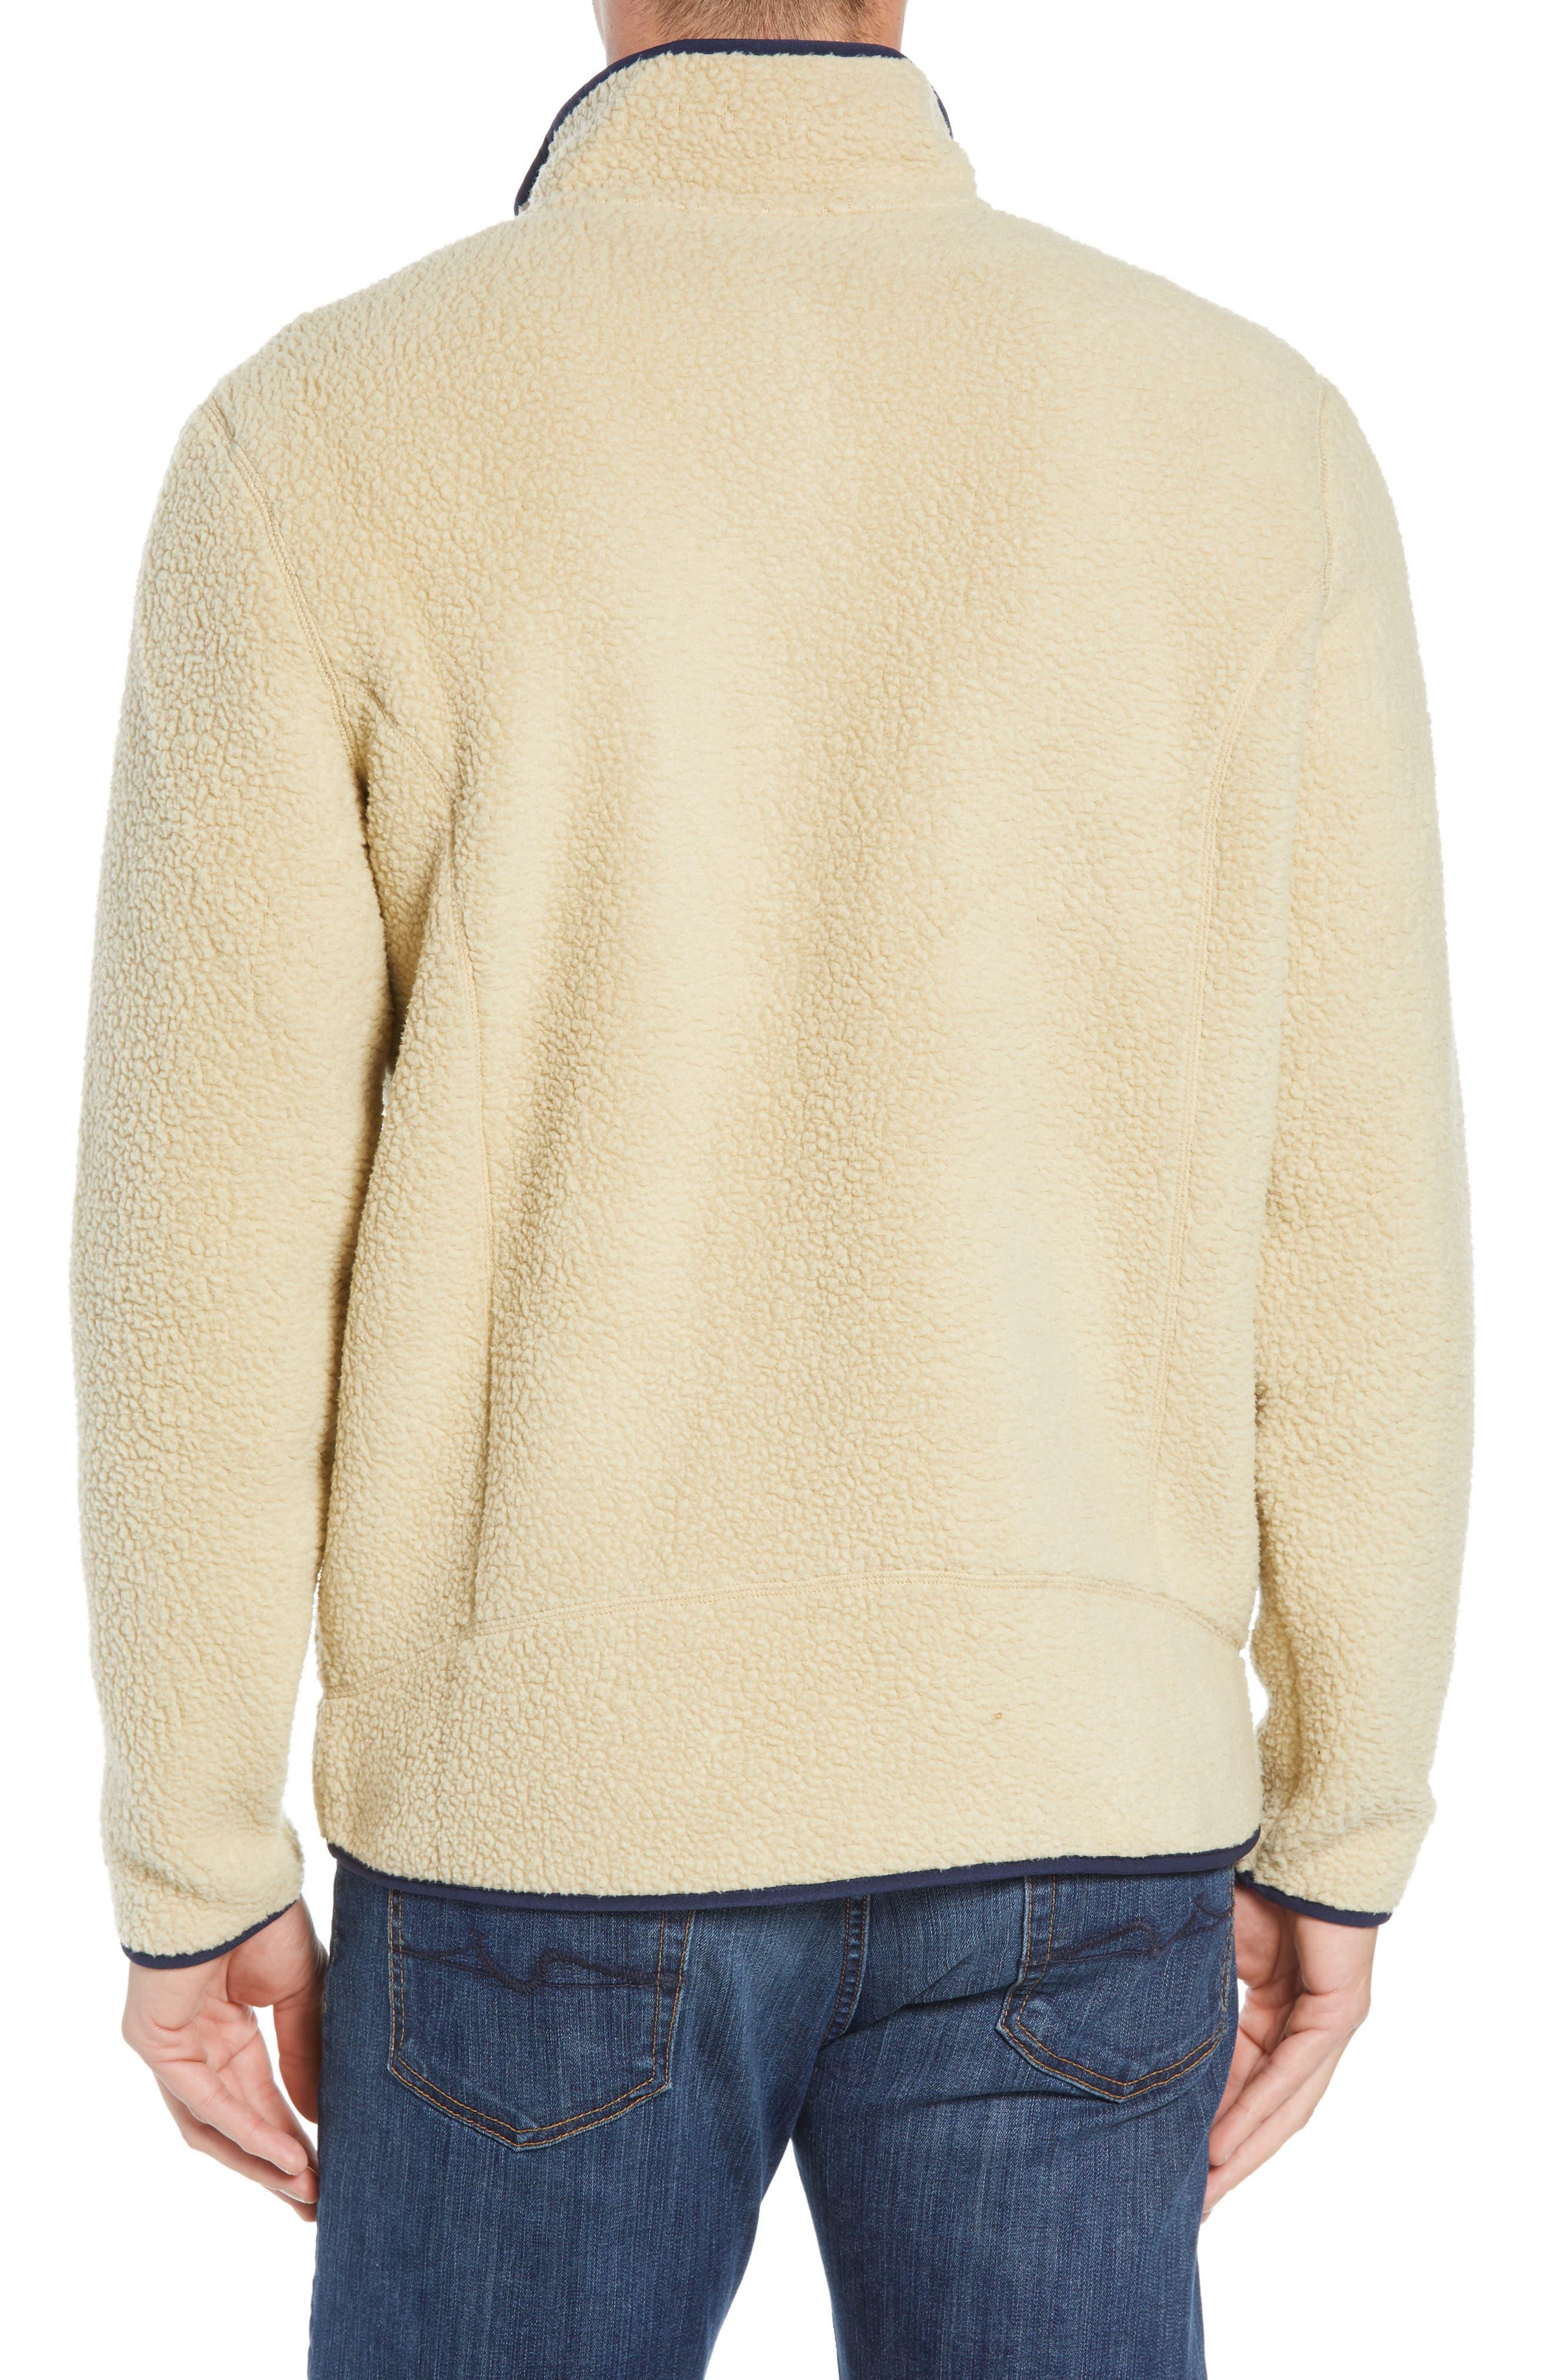 Retro Pile Fleece Zip Jacket,                             Alternate thumbnail 2, color,                             EL CAP KHAKI